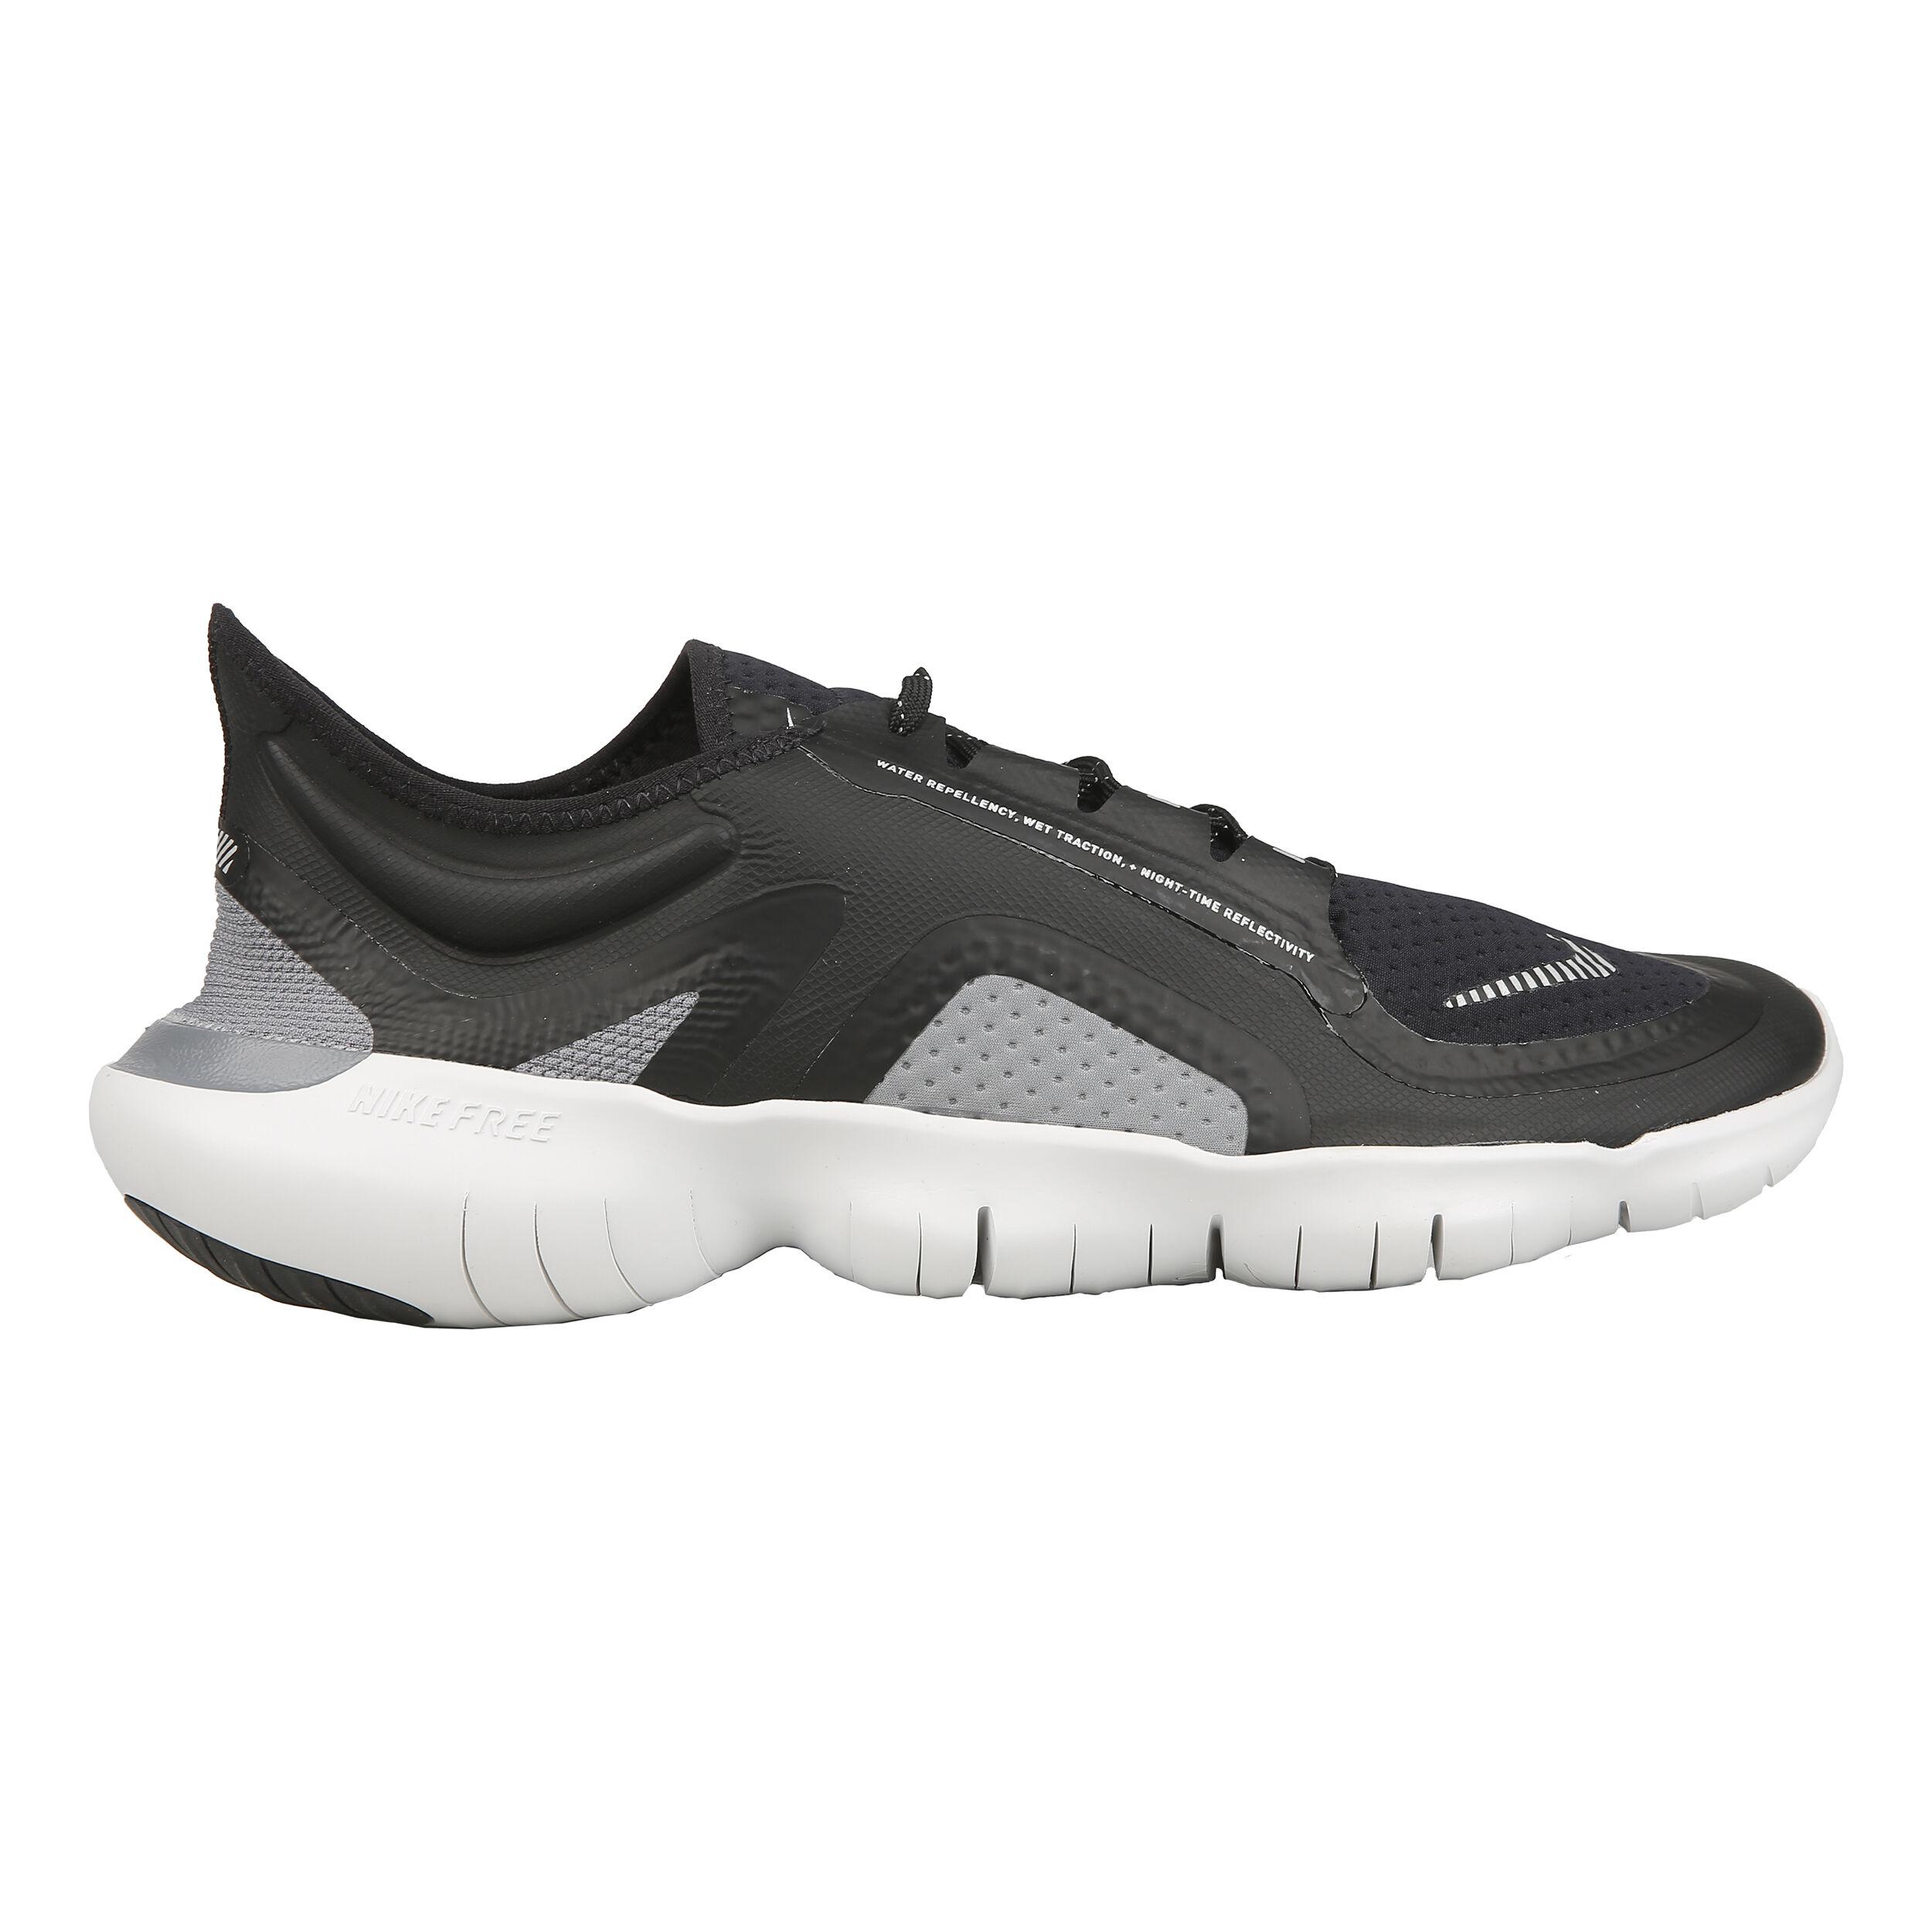 Nike free run 5.0 shield Men's